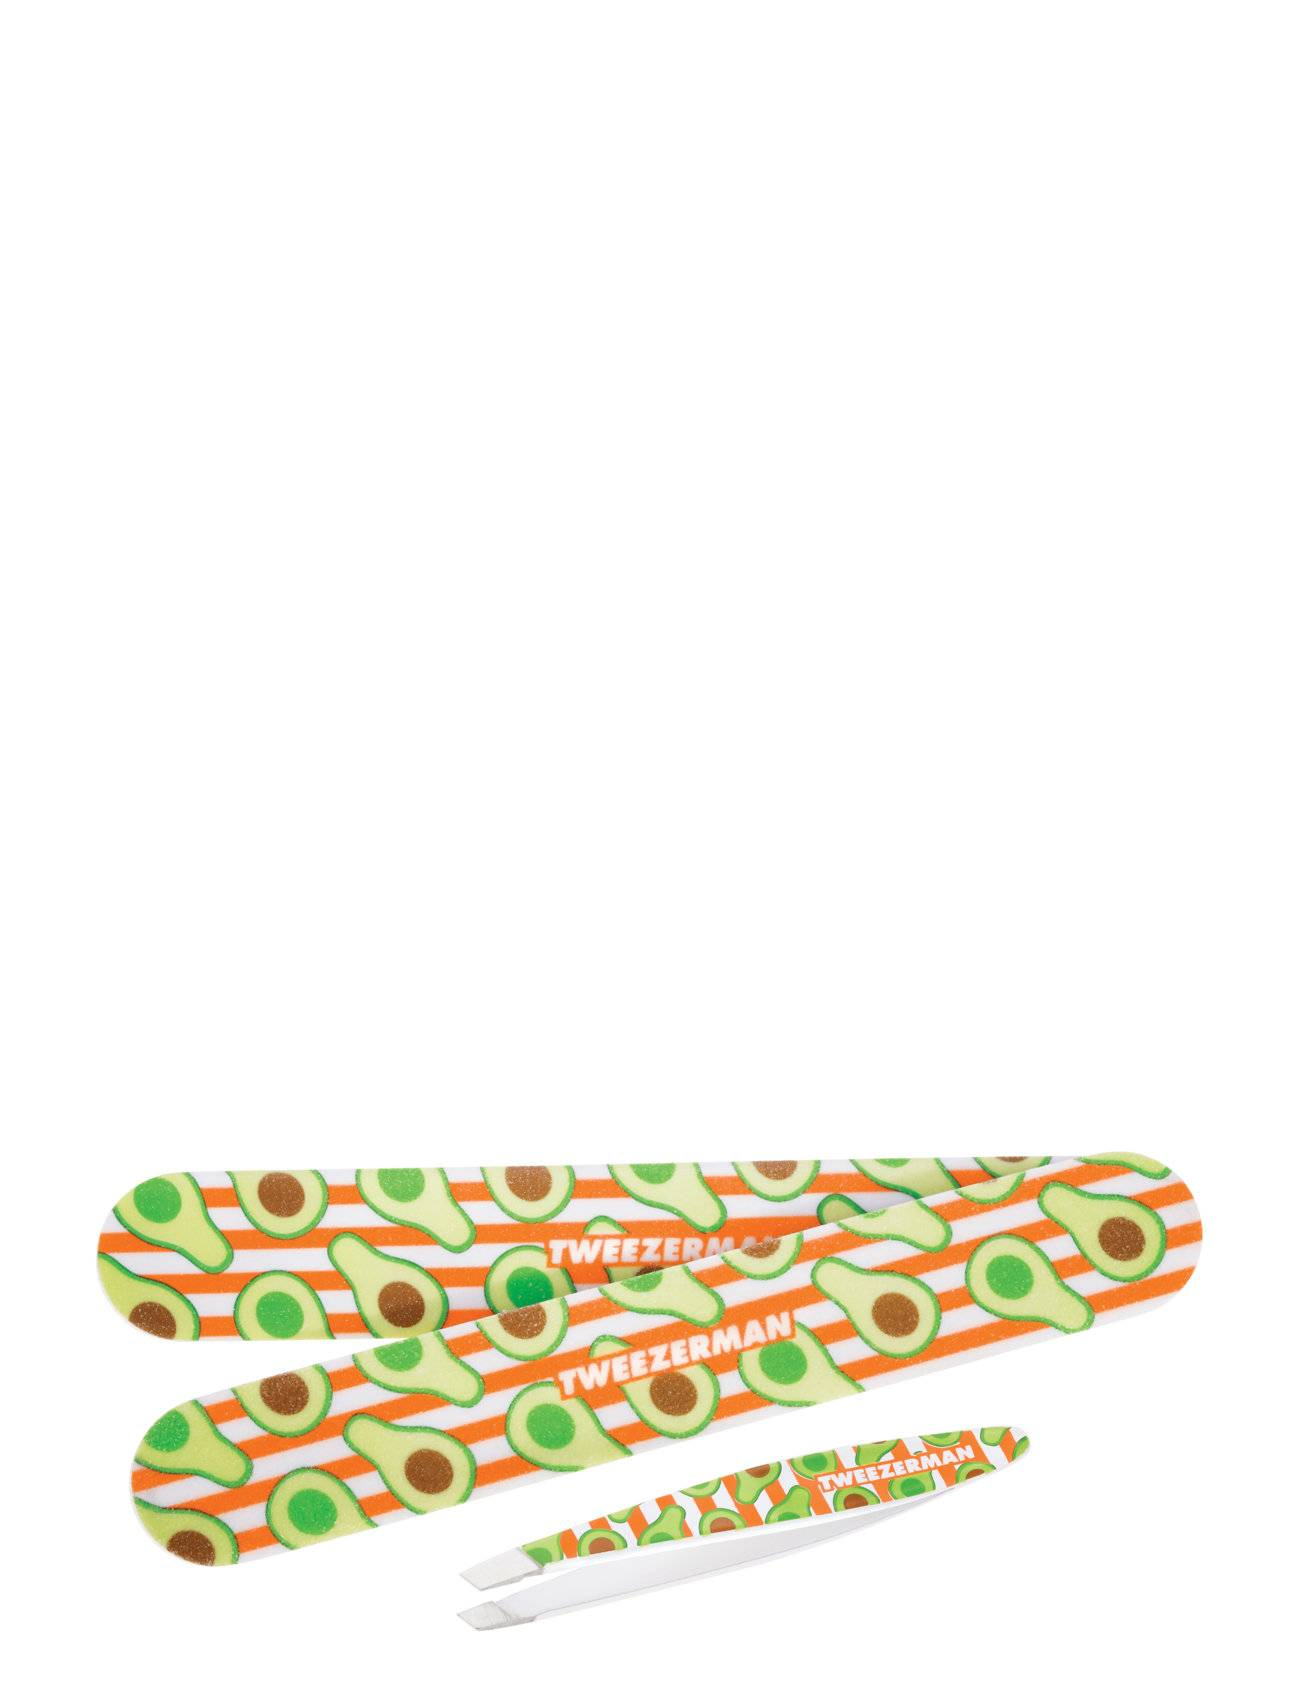 Tweezerman Avocado Duo Set Slant Tw & Nailfile